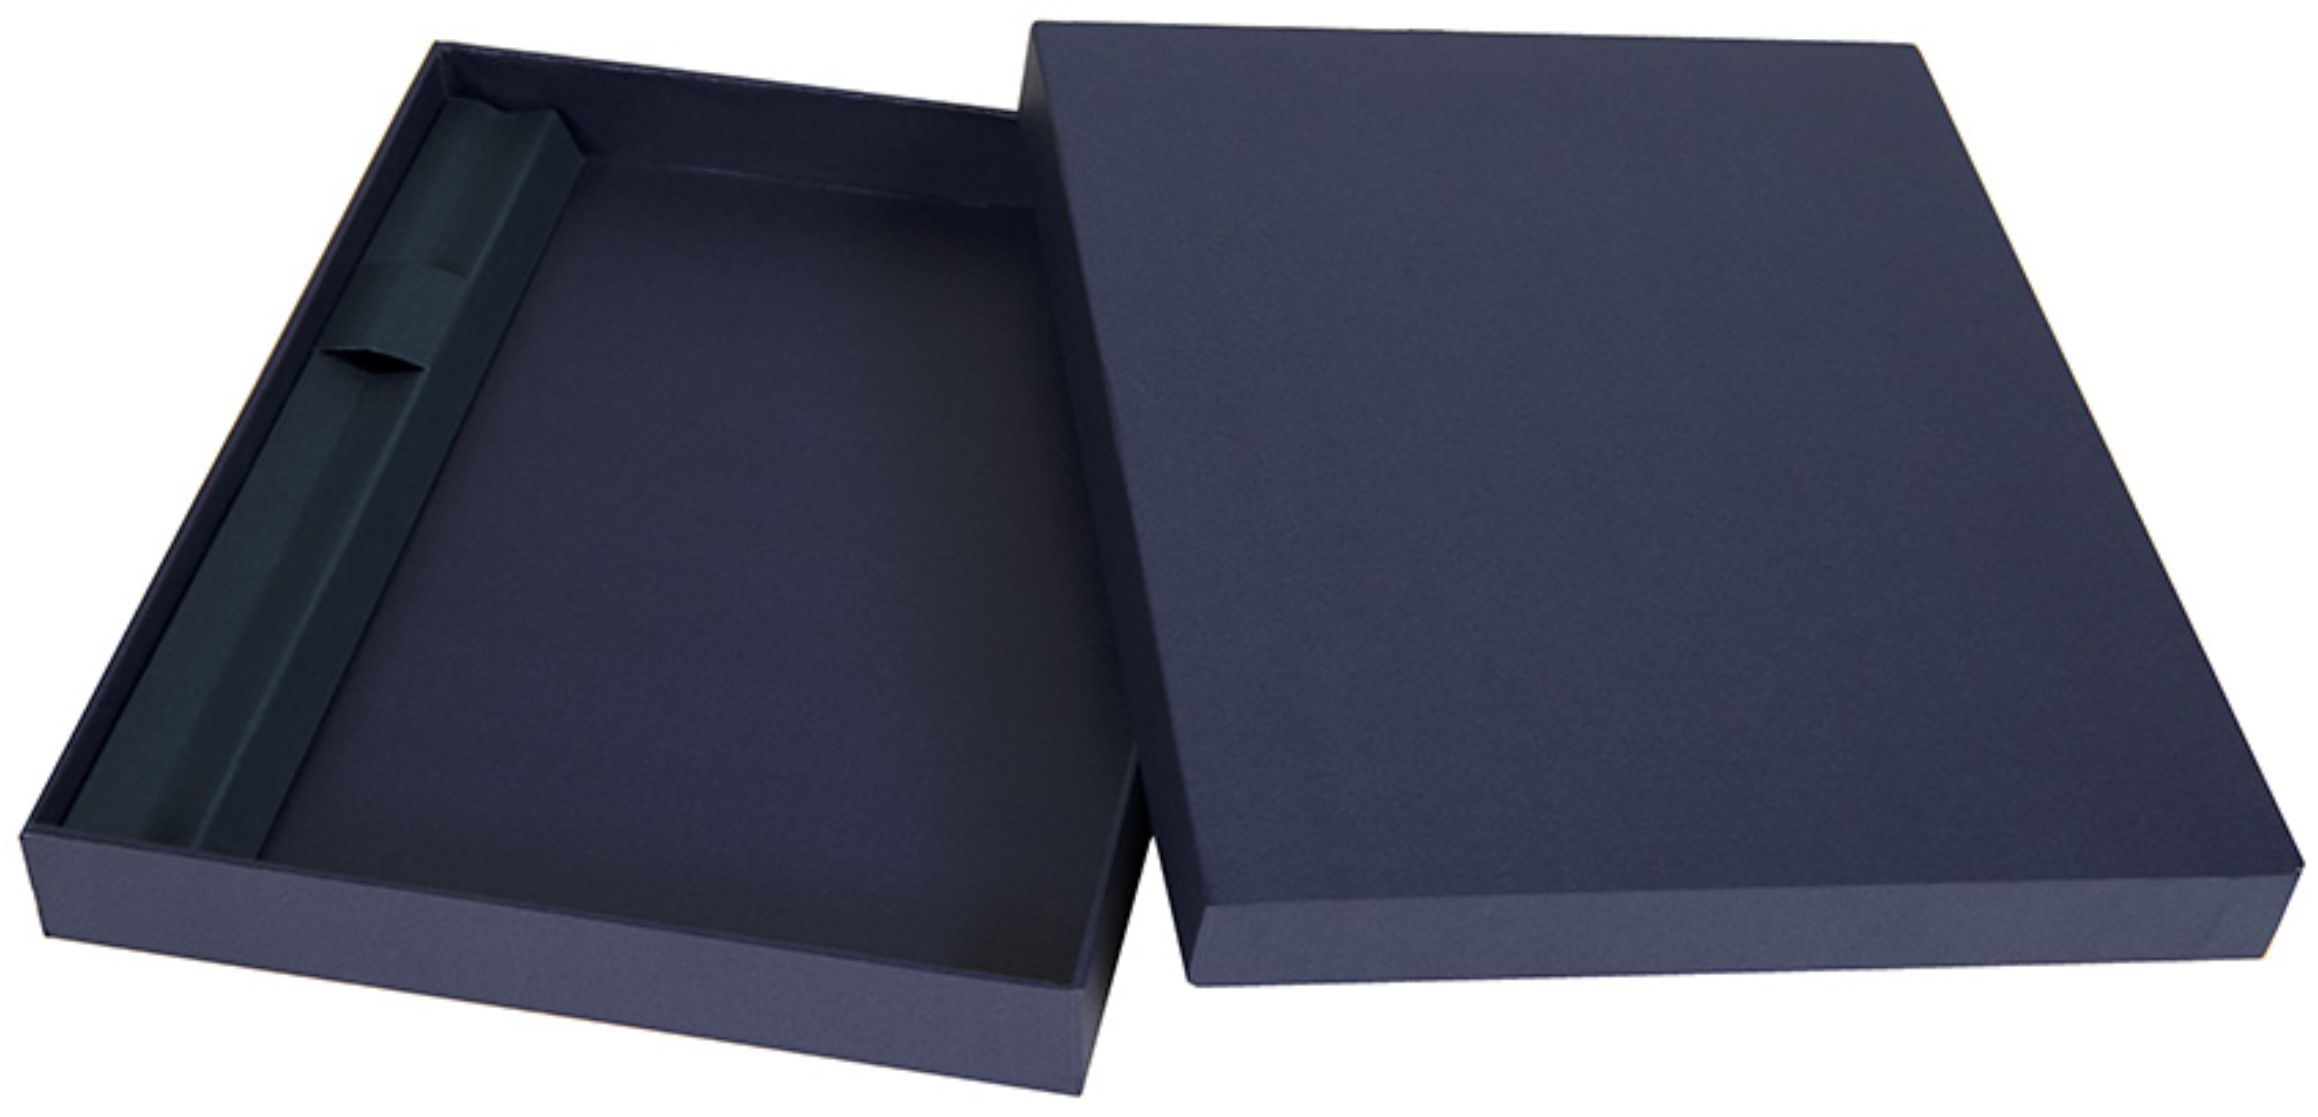 коробки для ежедневника и ручки